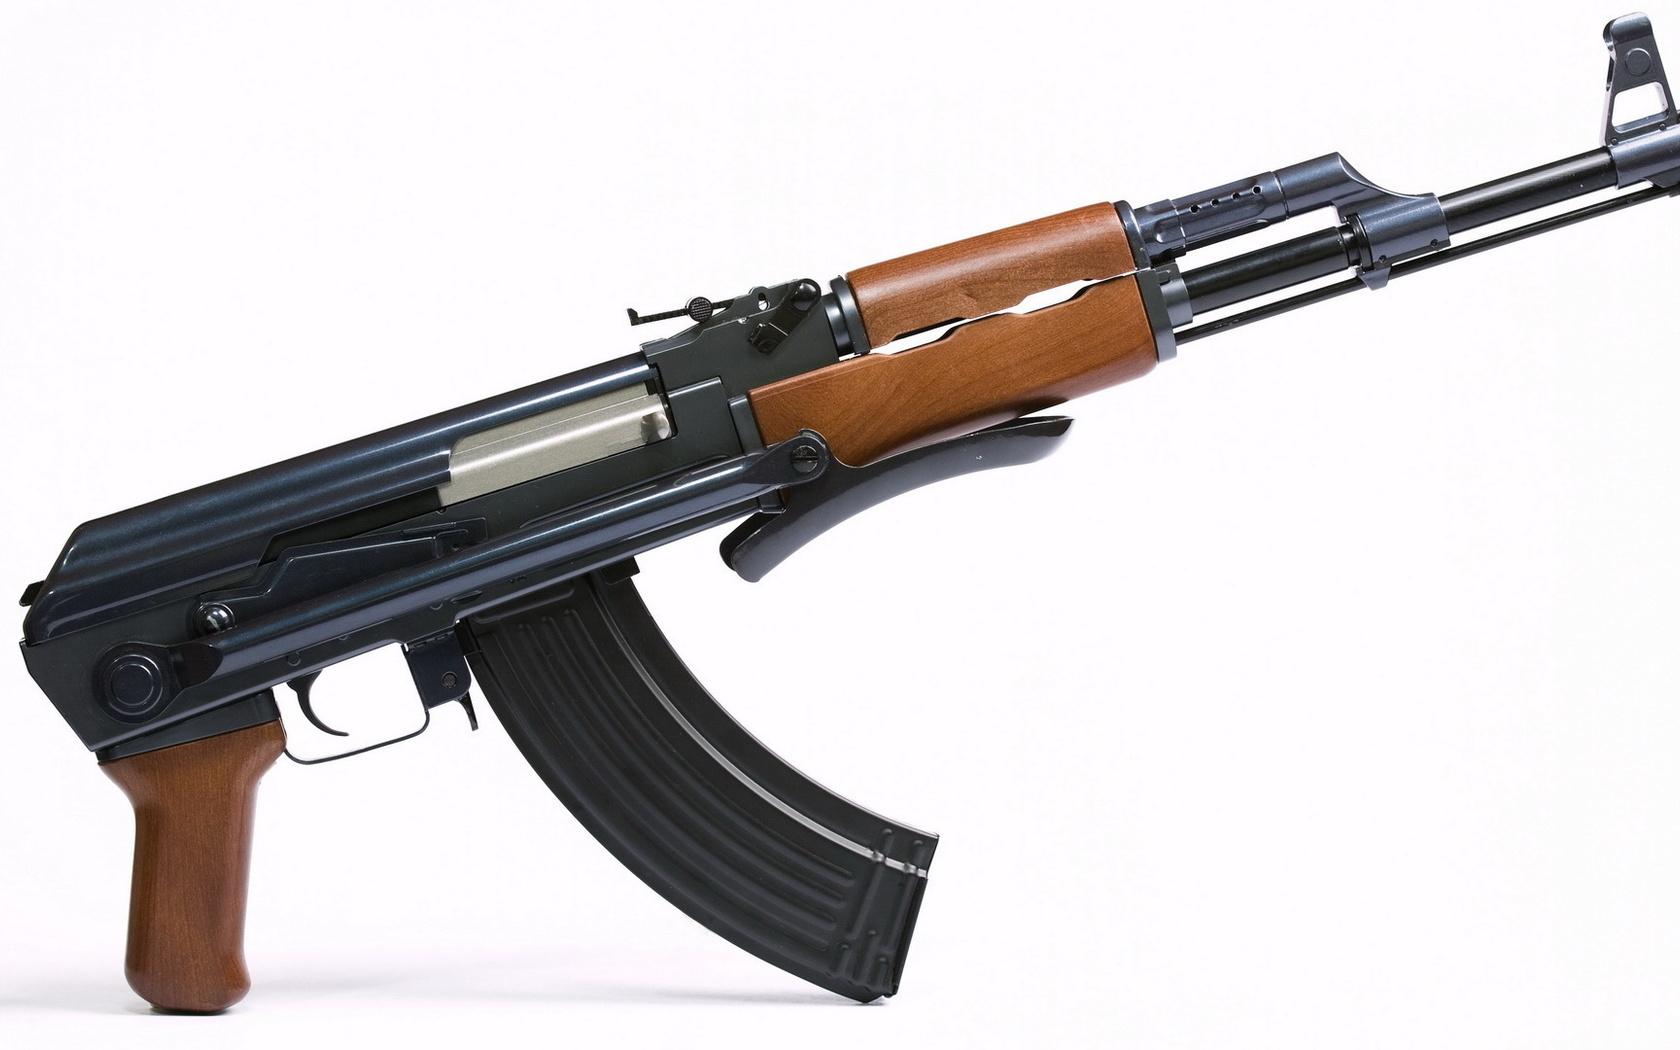 Pulpit Kaasznikowa karabin ak 47 broni du 1680x1050 Zdjcia 1680x1050